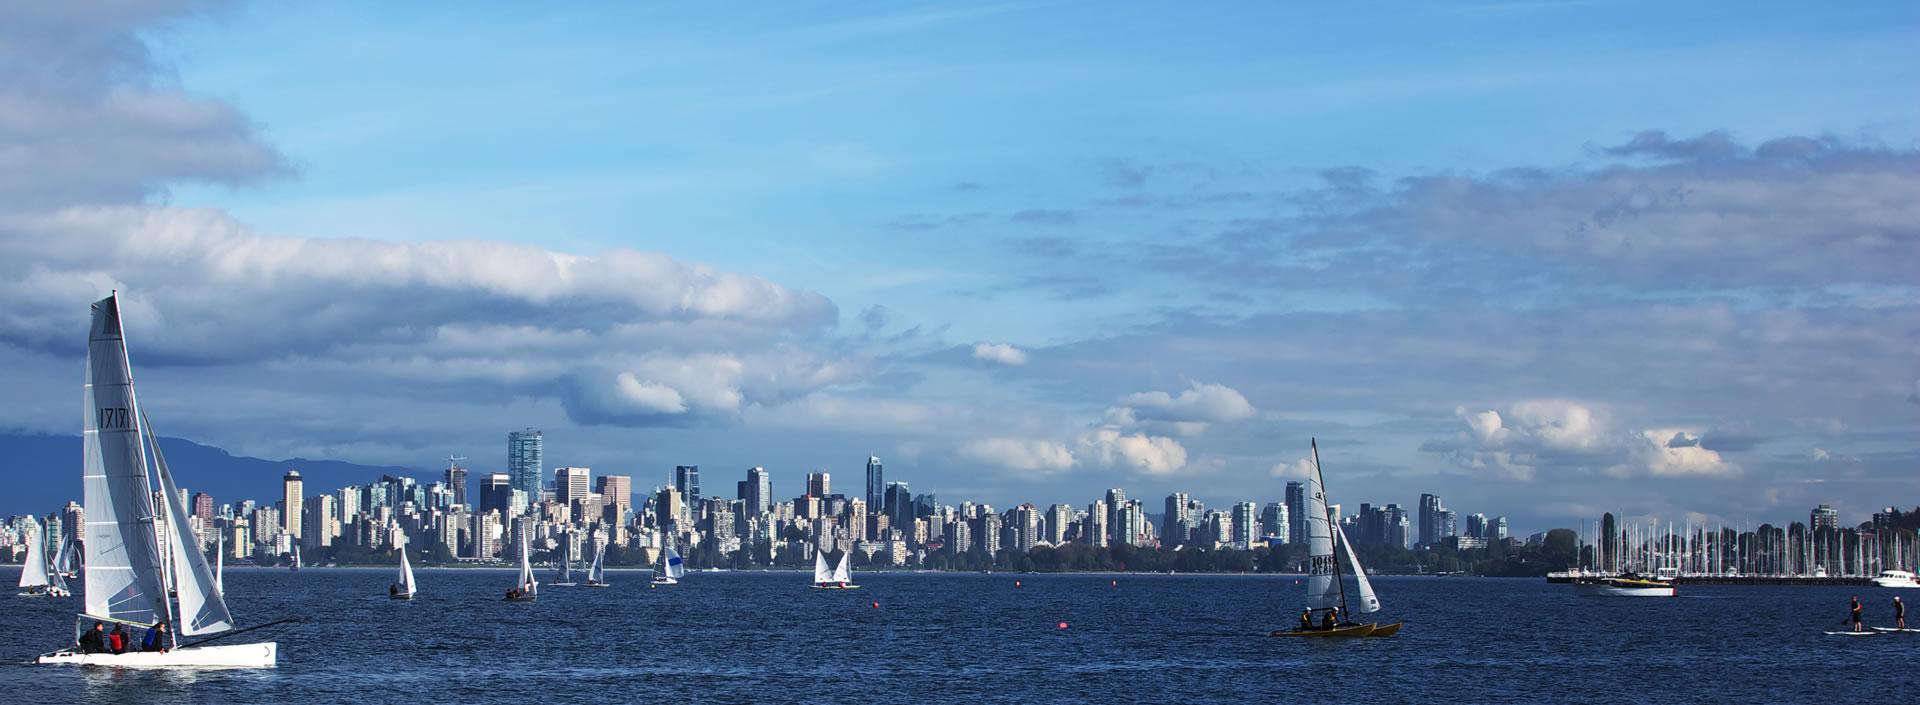 water-skyline